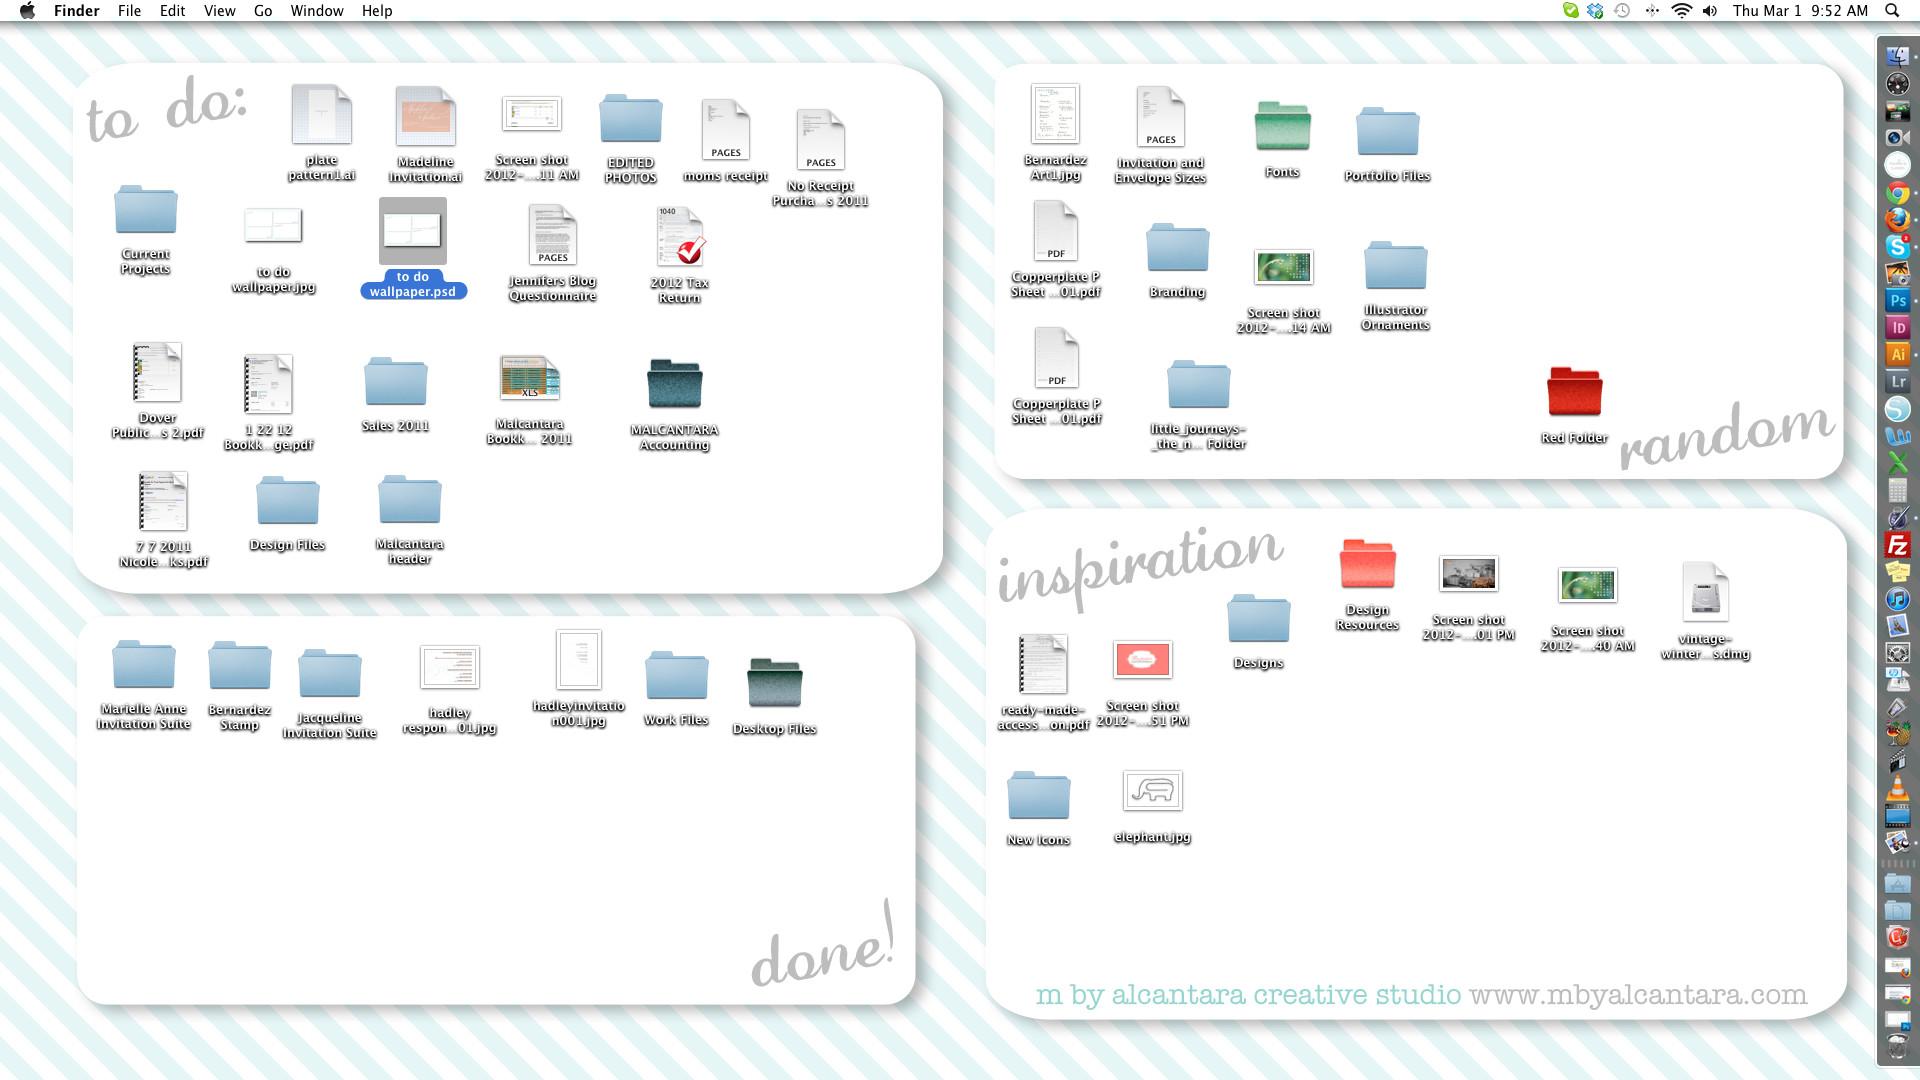 Swell Computer Desktop Organizer Wallpaper 67 Images Download Free Architecture Designs Rallybritishbridgeorg